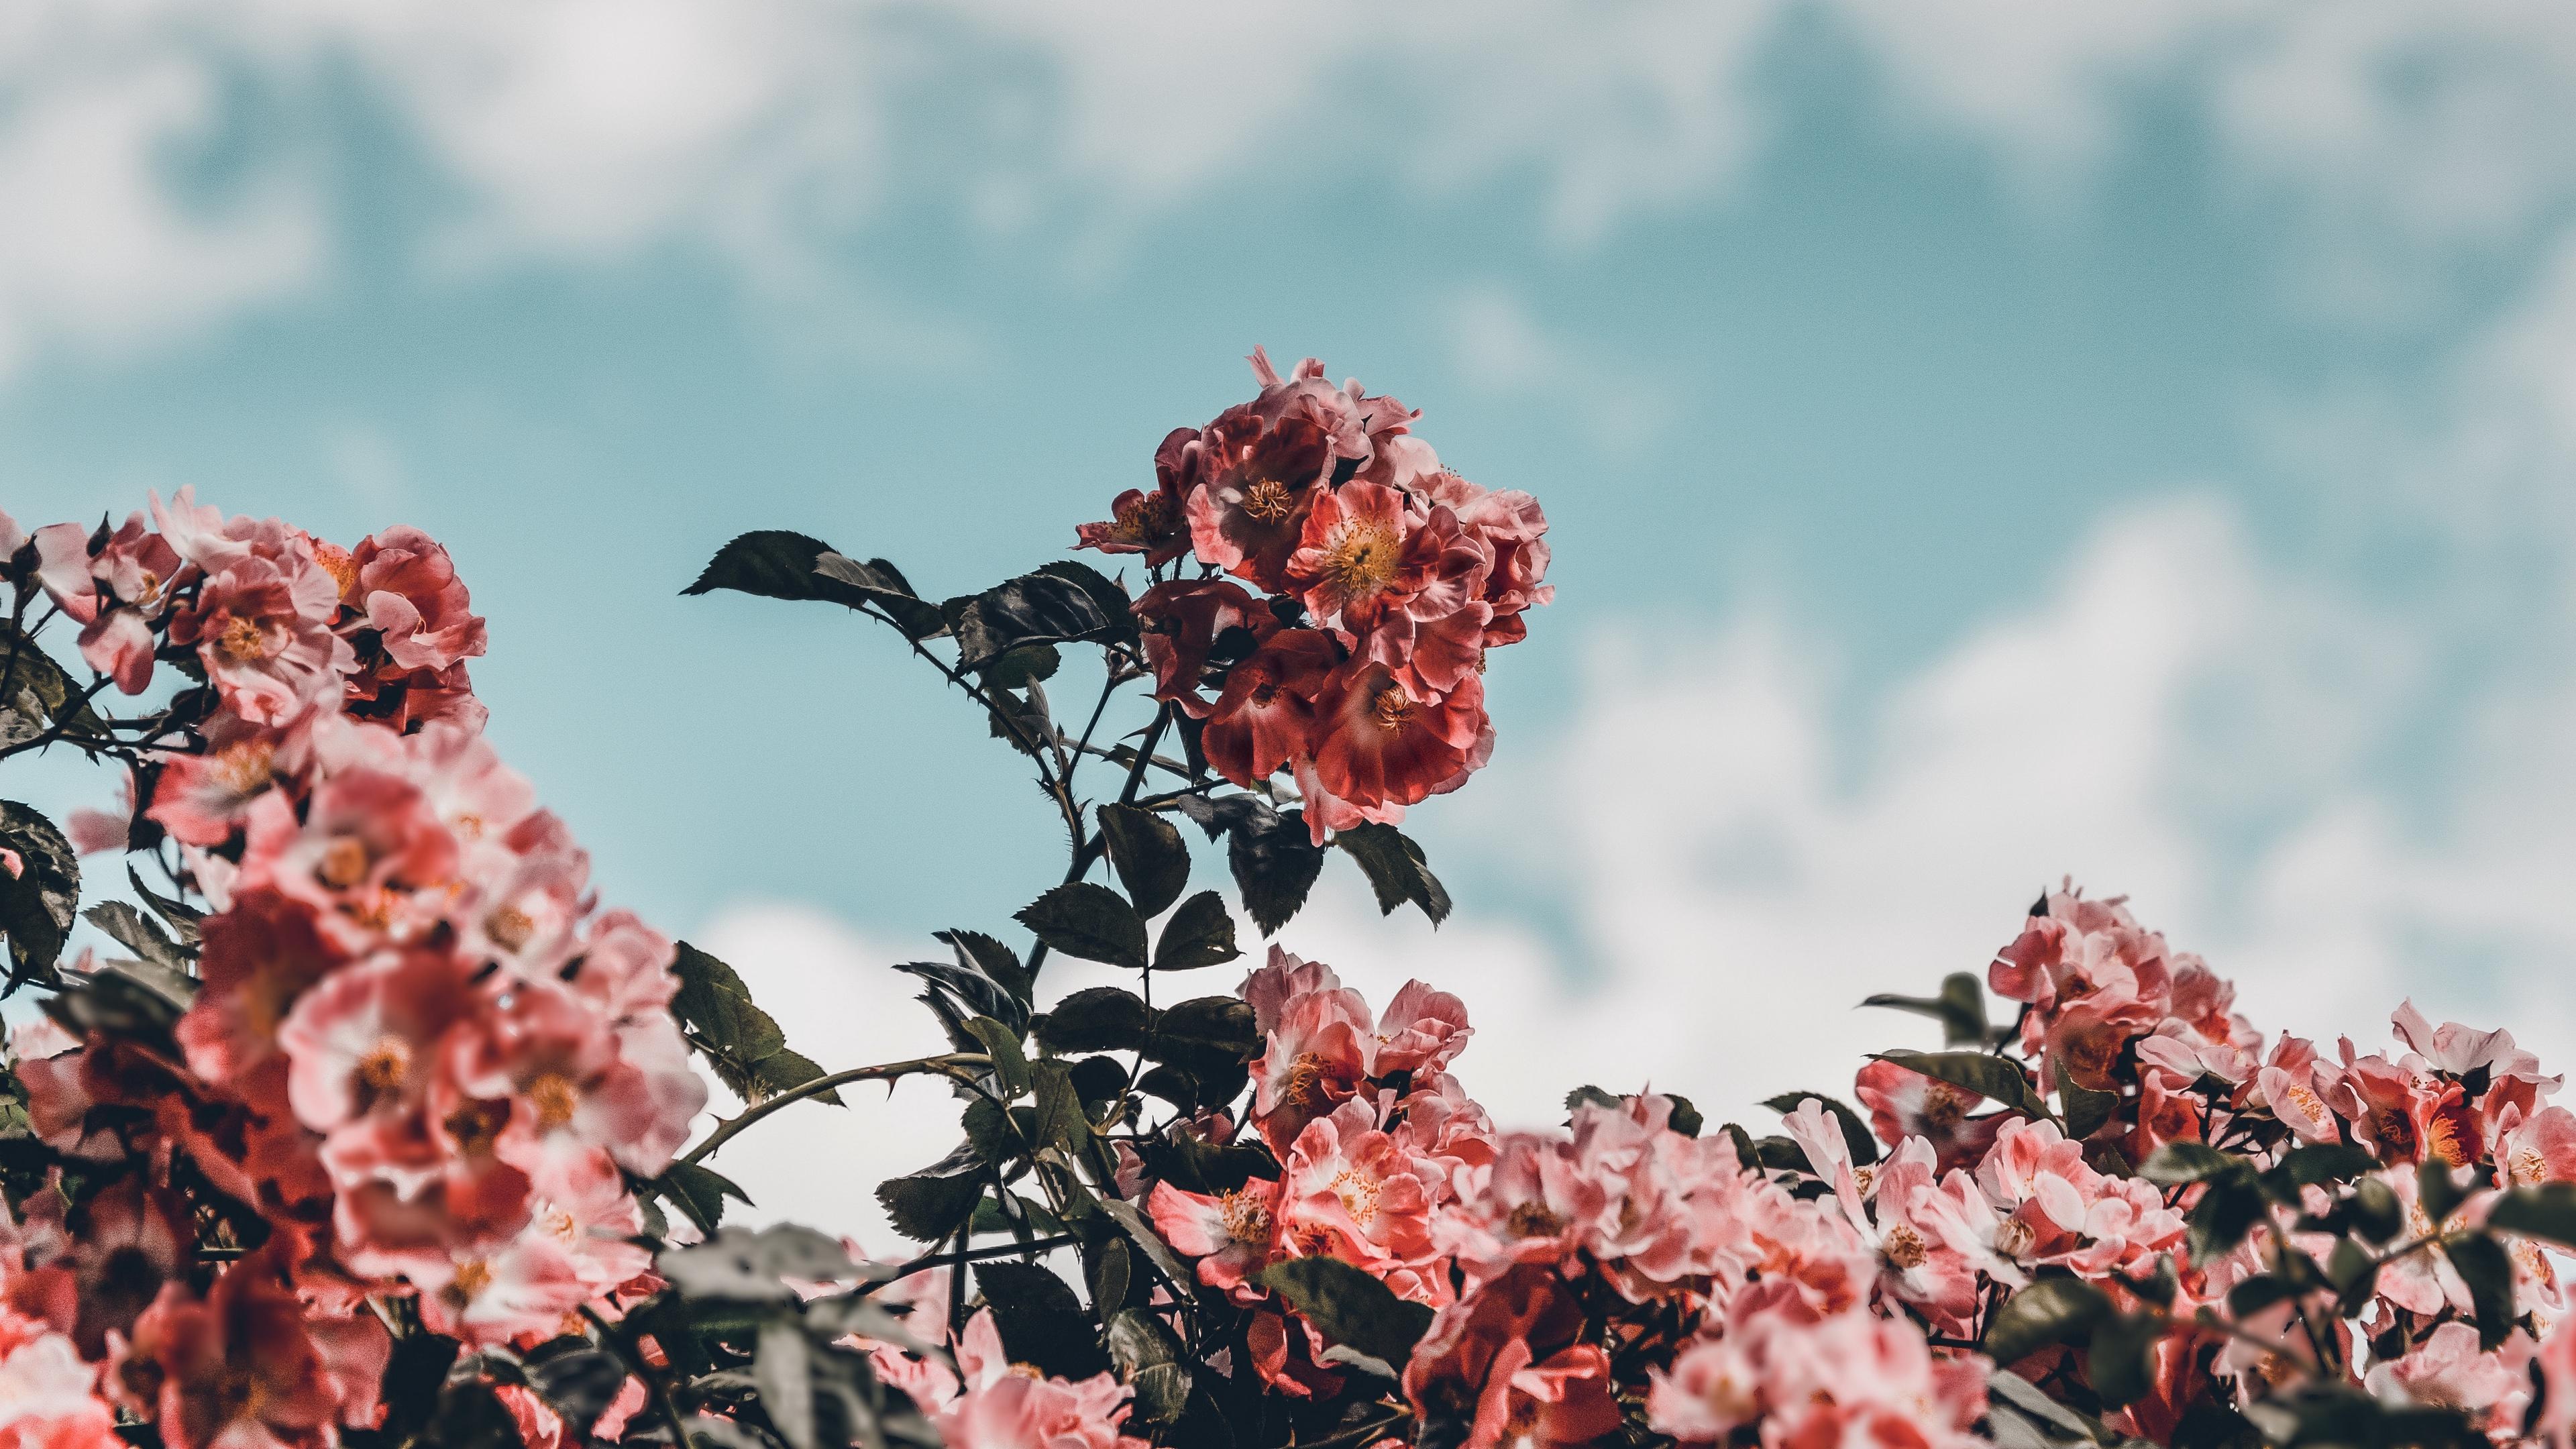 flowers bloom bush sky 4k 1540064896 - flowers, bloom, bush, sky 4k - Flowers, Bush, Bloom